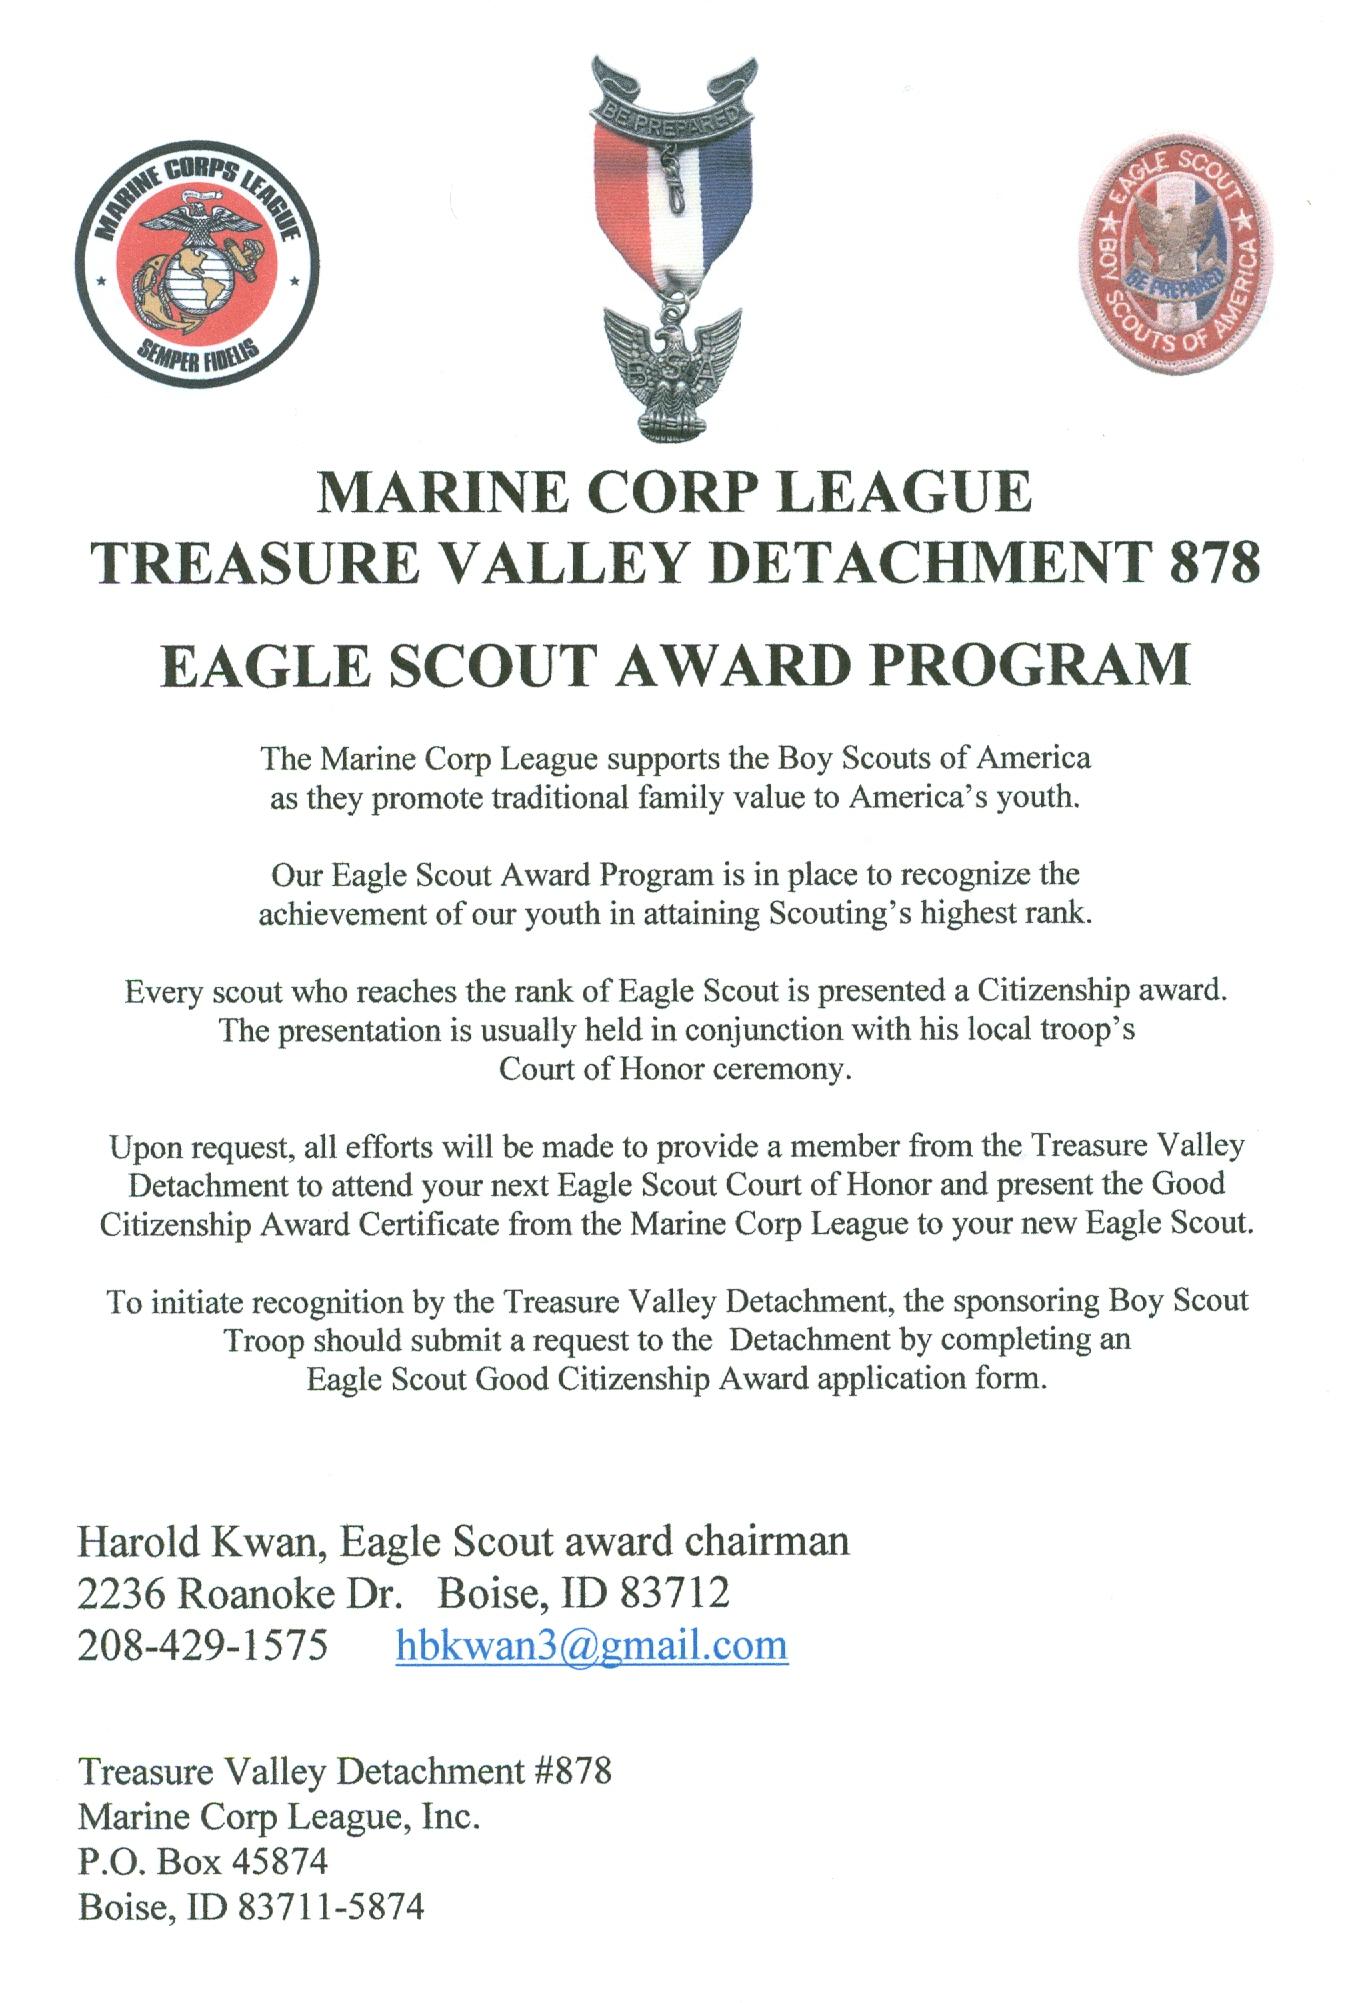 Eagle Scout Good Citizenship Award | Treasure Valley Detachment ...